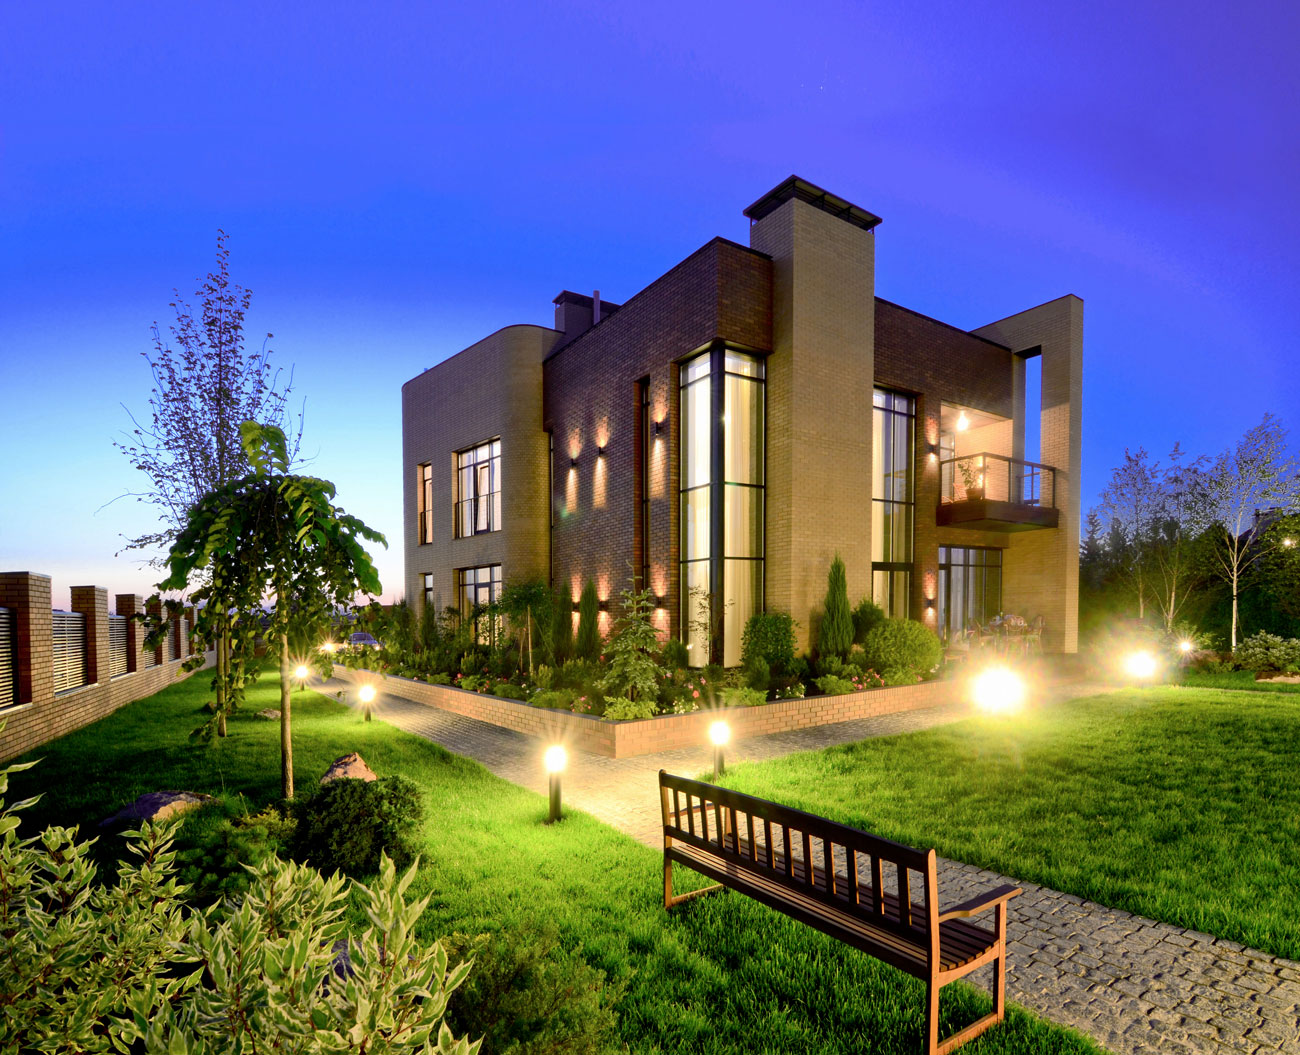 kiev residence by yunakov architecture construction